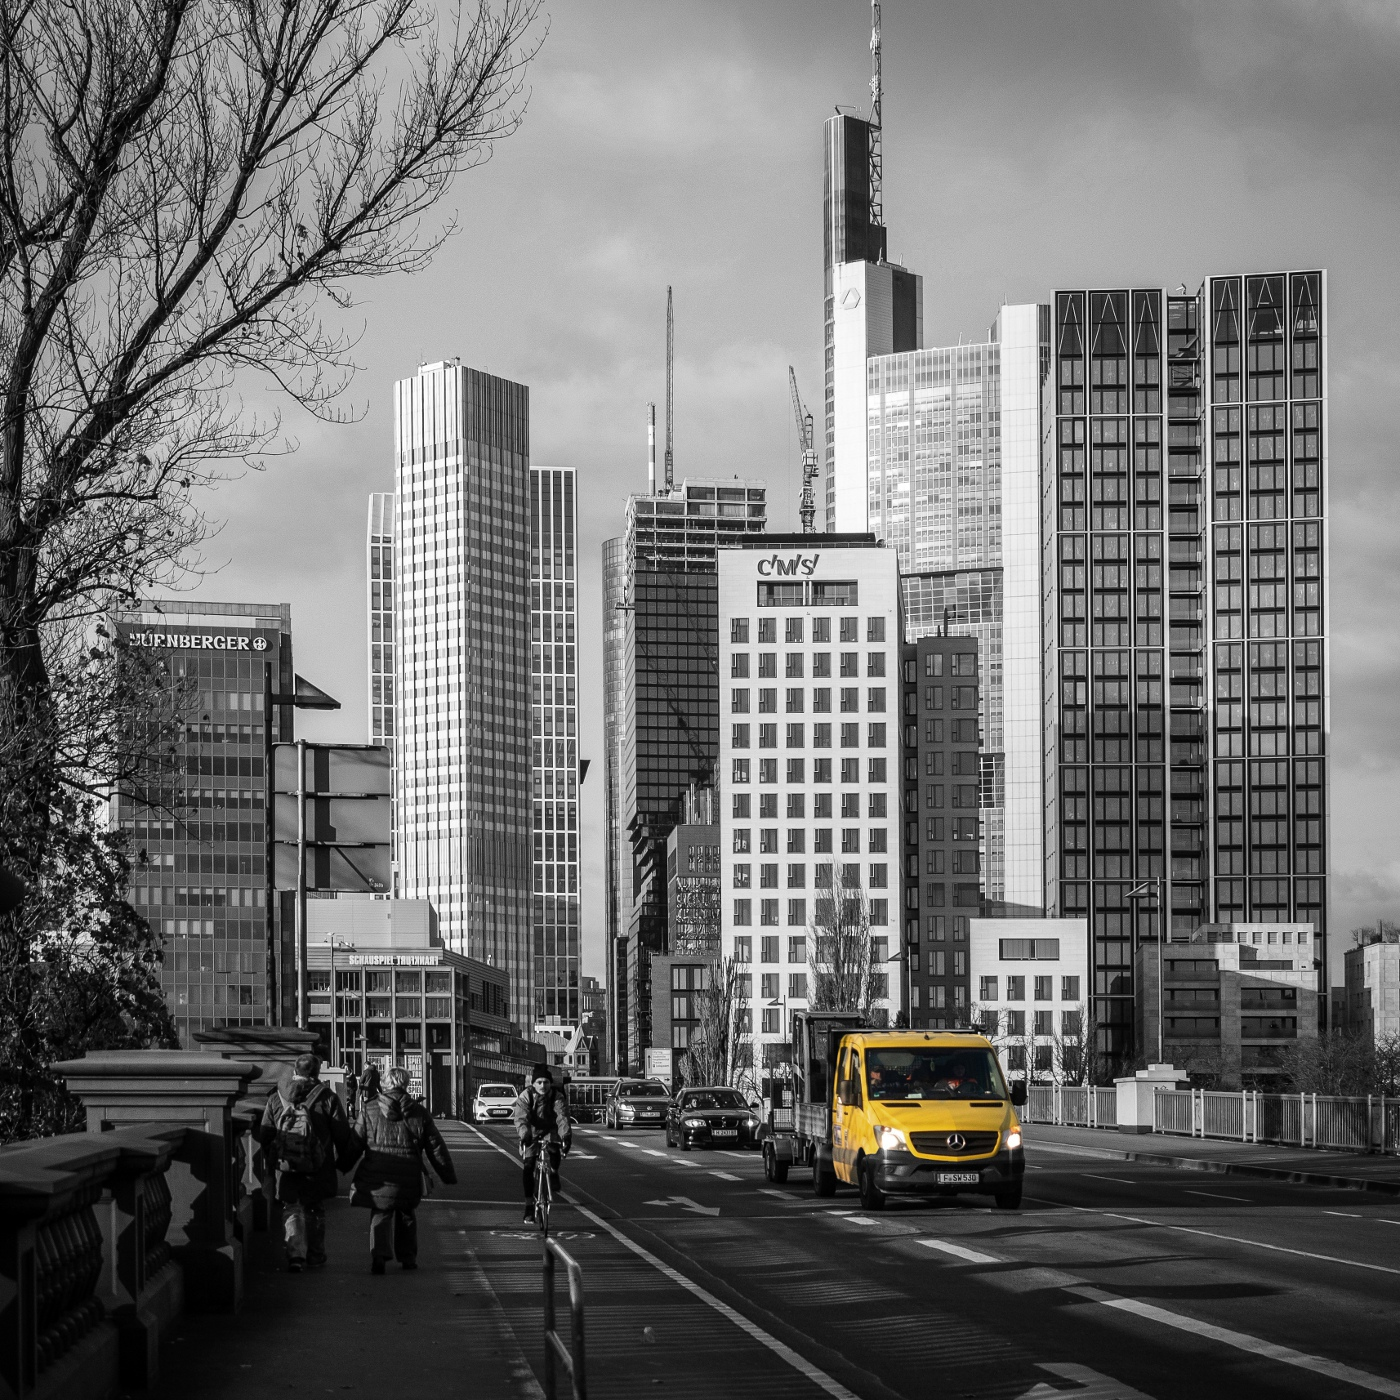 Skyline from Frankfurt Main | © wolfgang röser